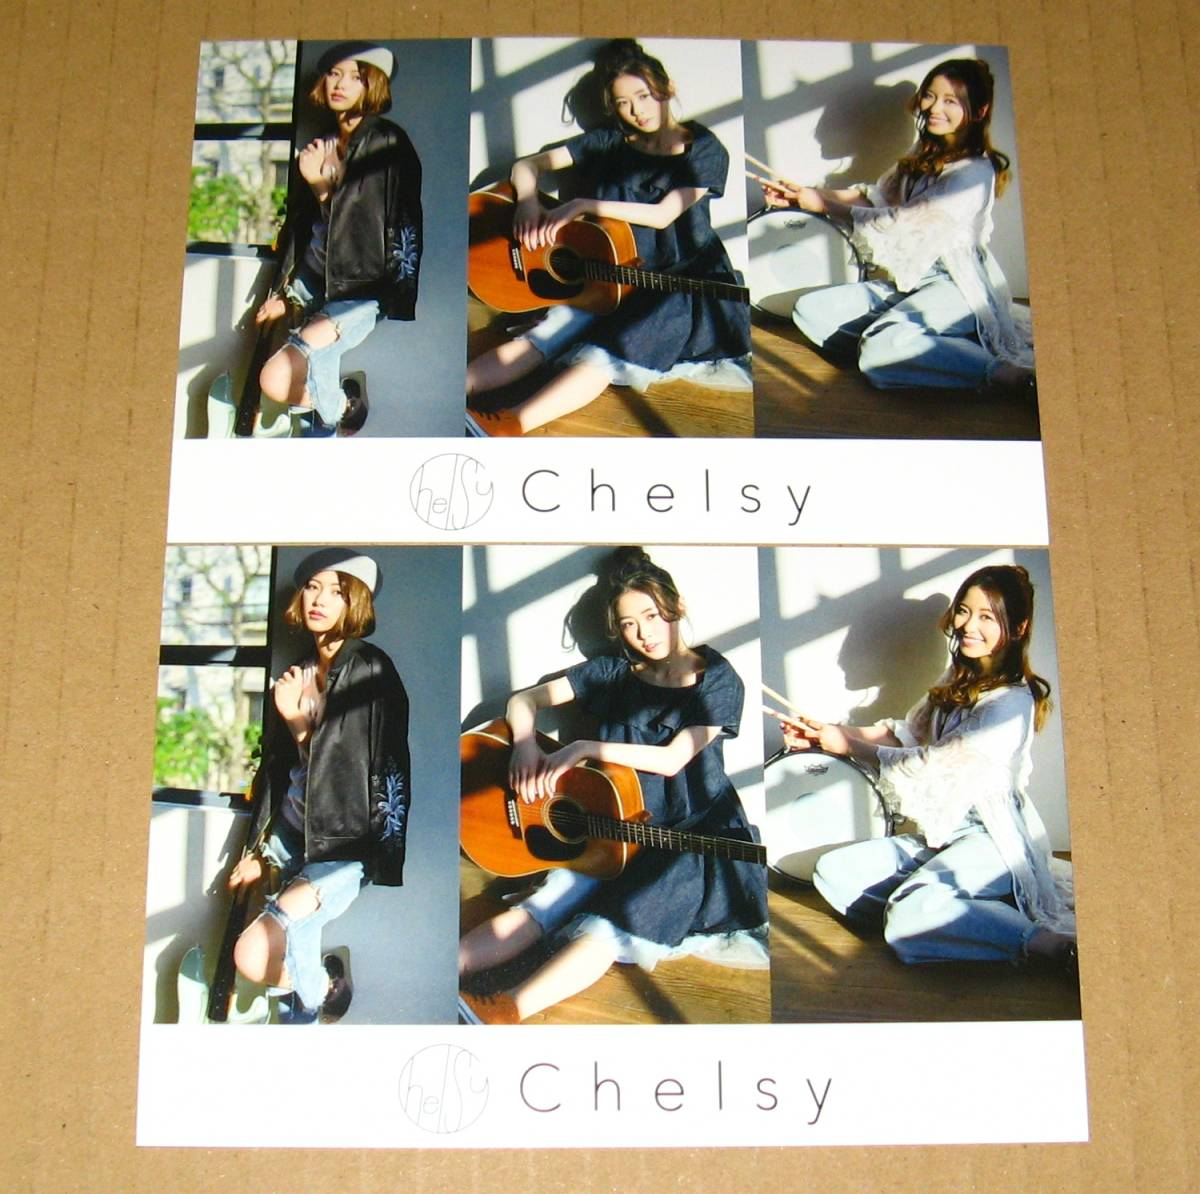 Chelsy [WILL BE FINE TOMORROW] イベント限定ポストカード 2枚セット